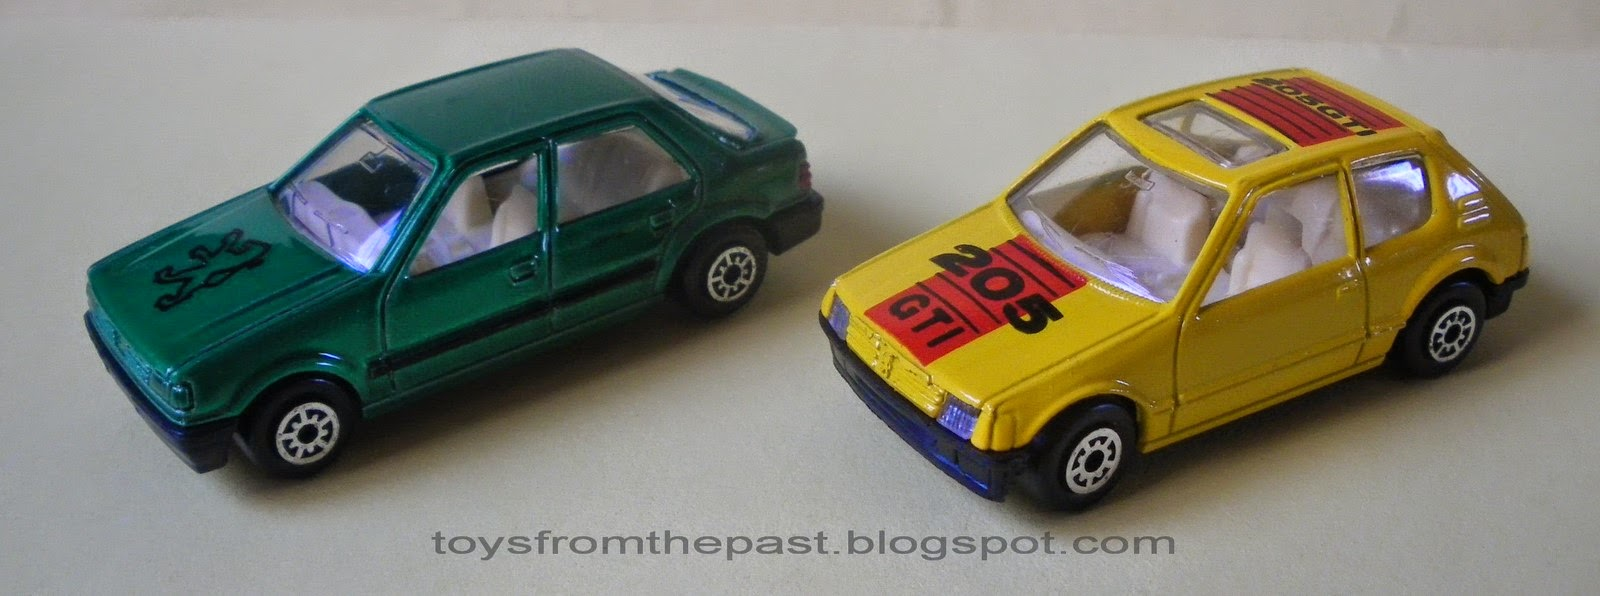 Maisto Company Metal Cars